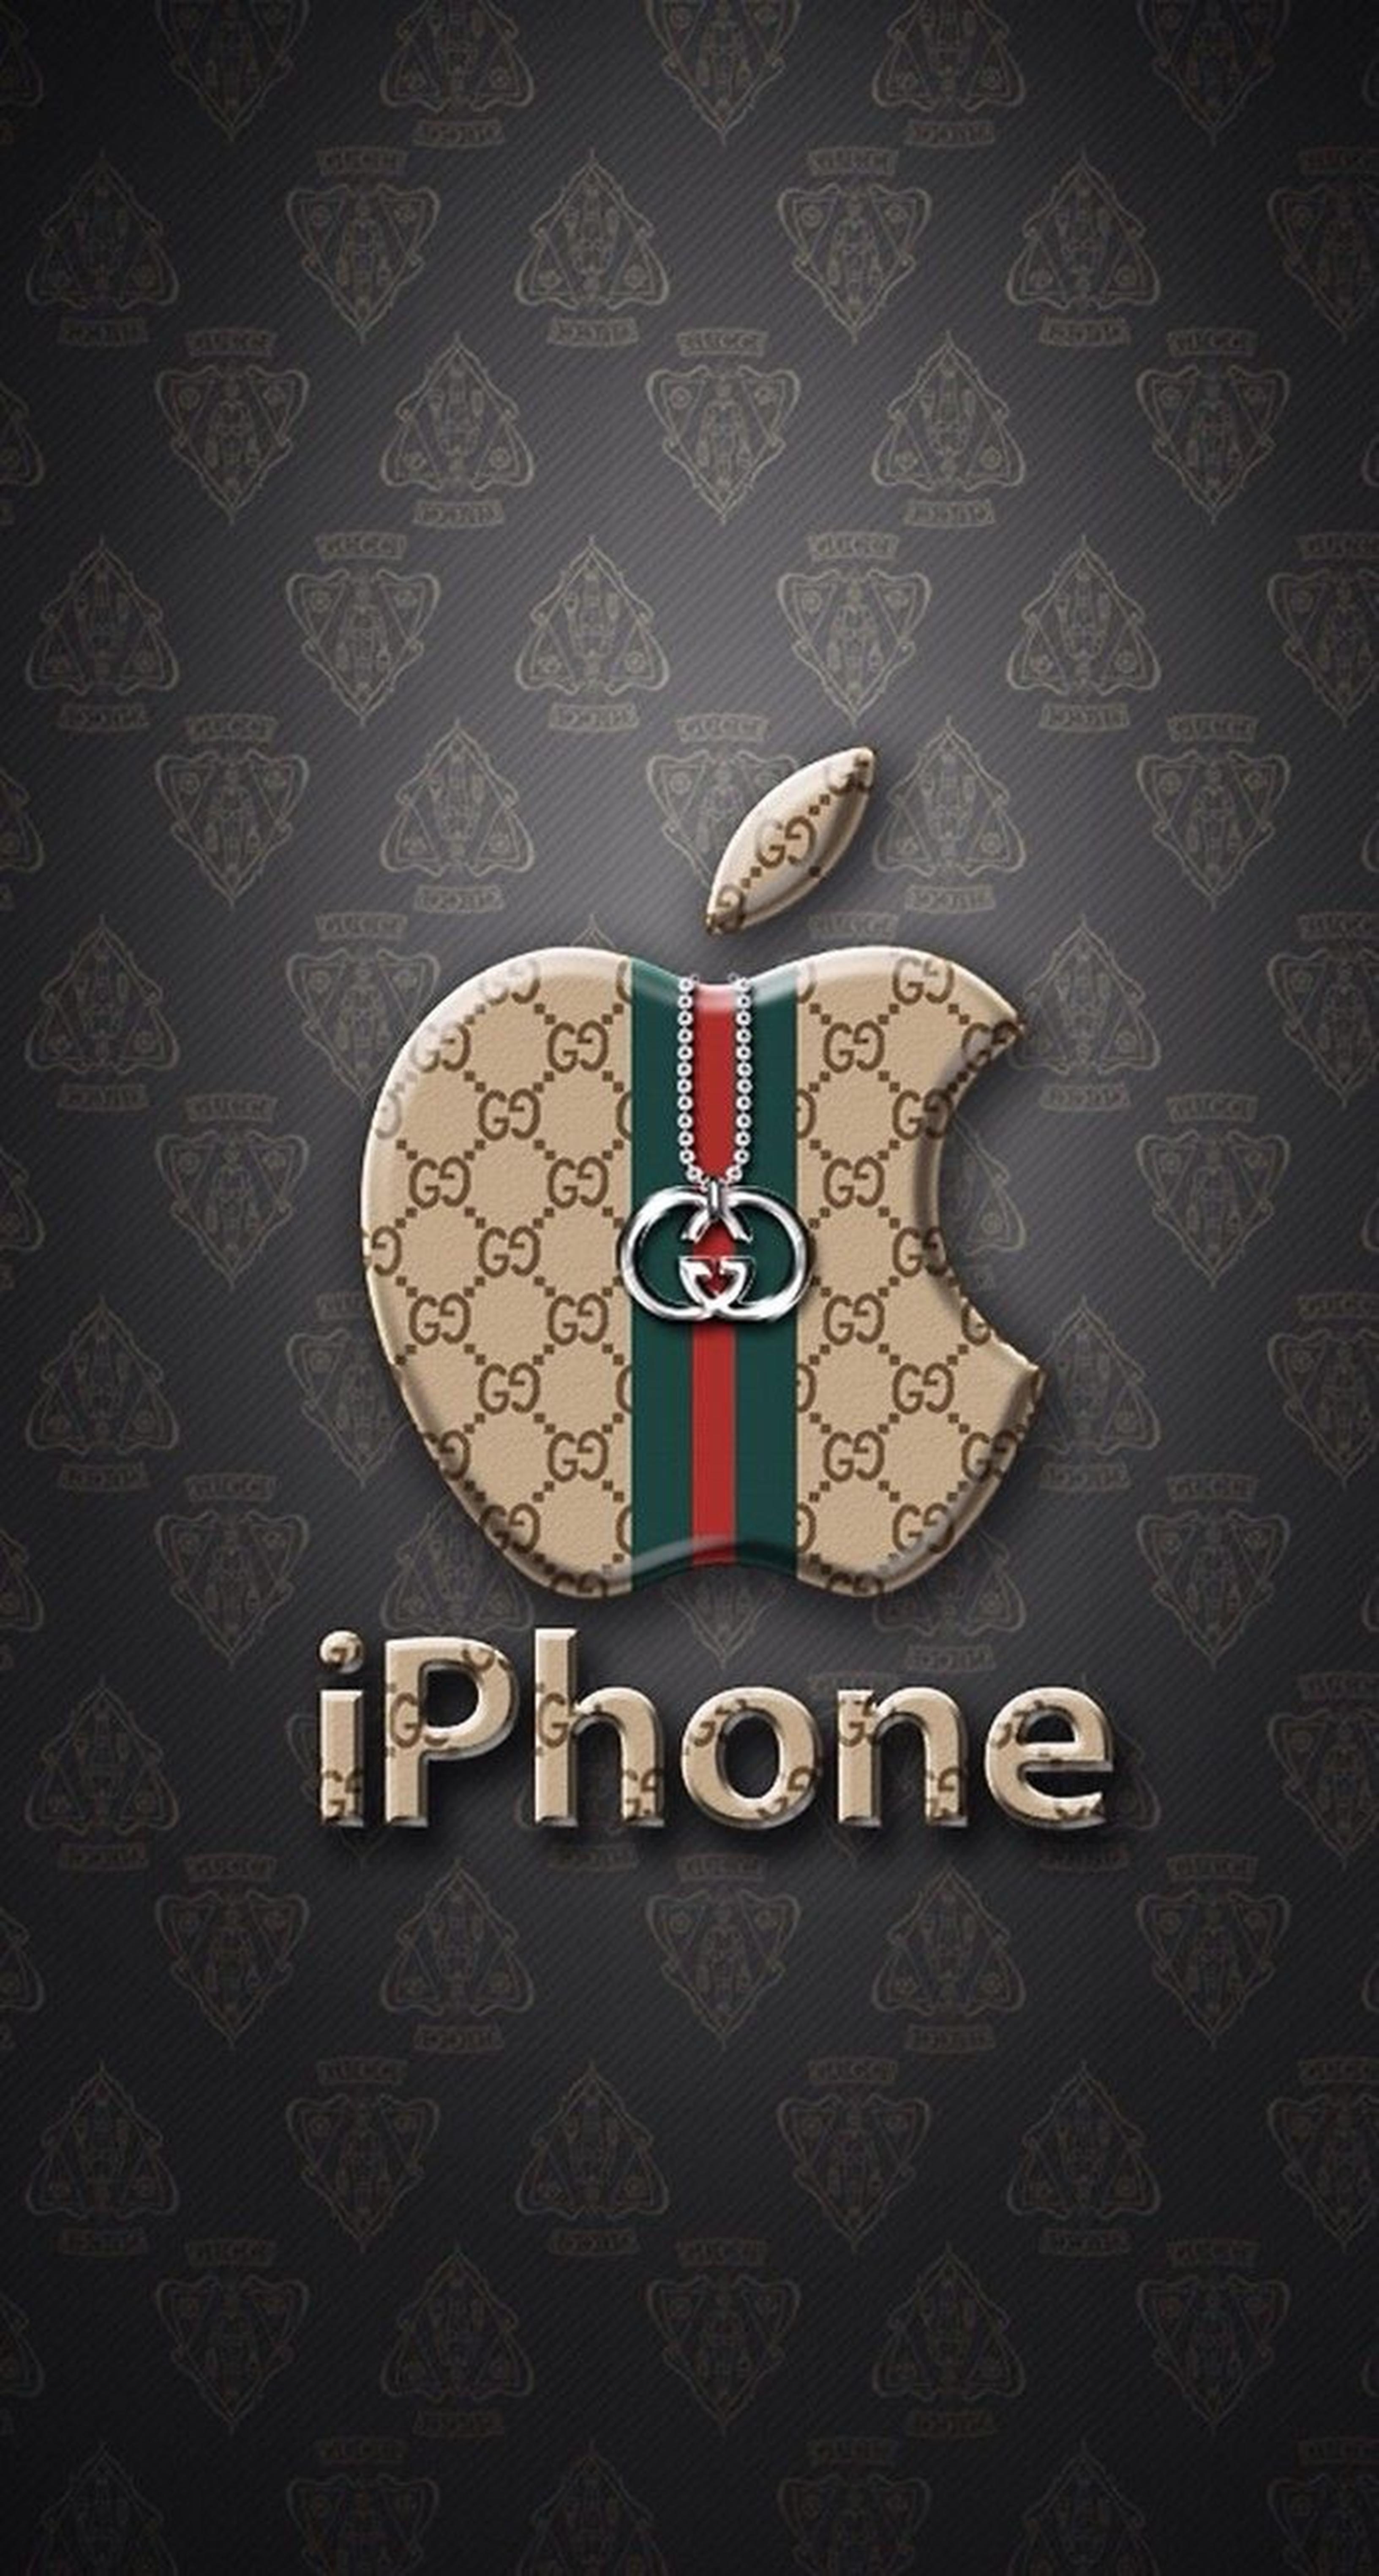 ccab7ca85c3 Gucci X Supreme Wallpapers - Top Free Gucci X Supreme Backgrounds ...